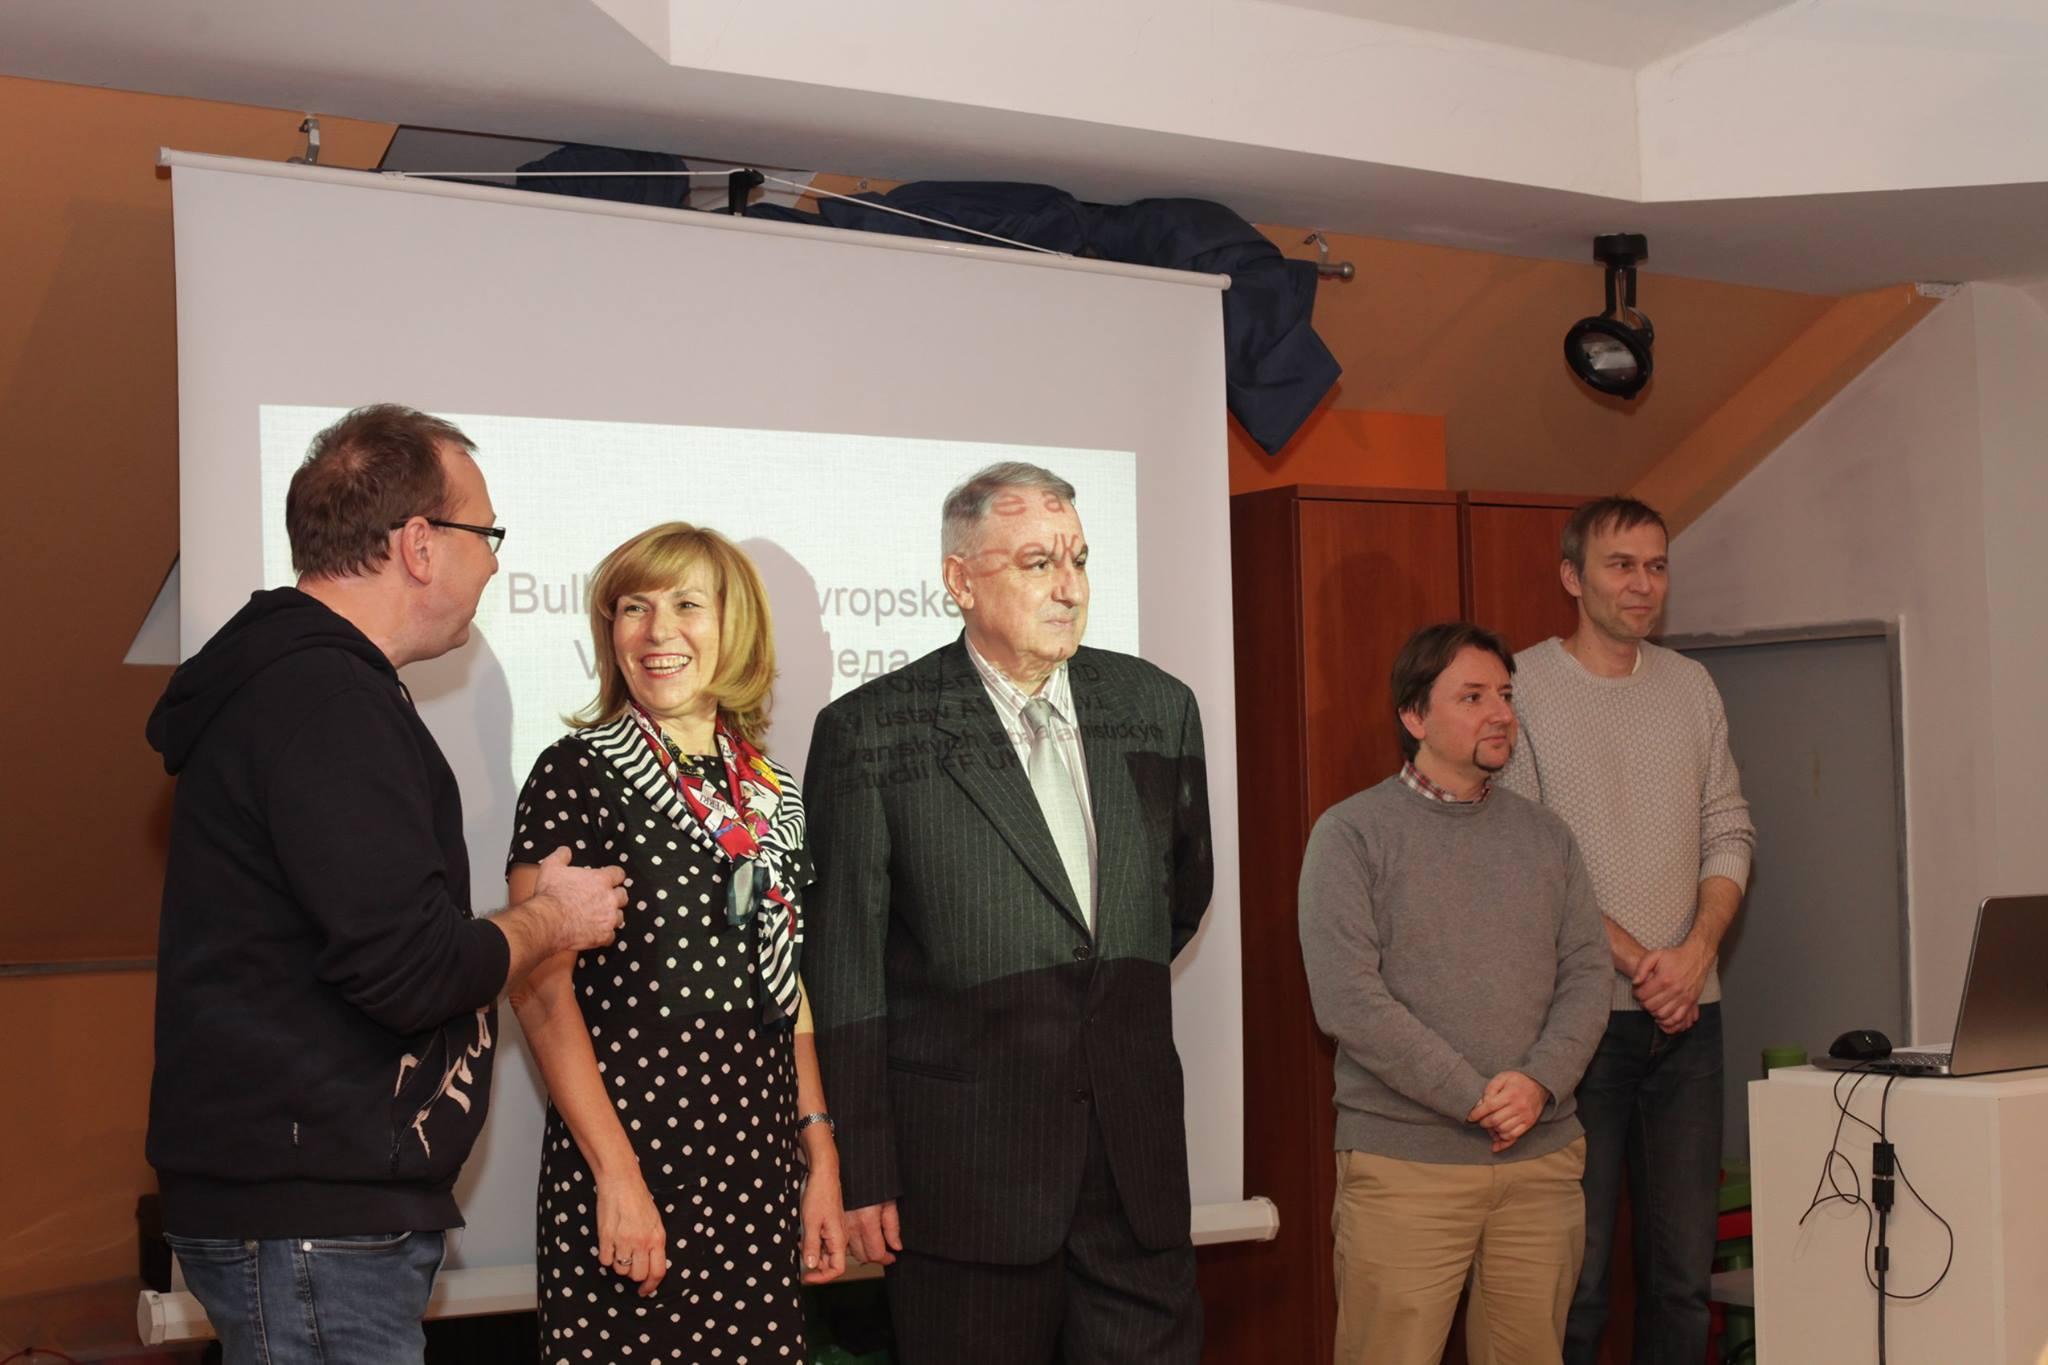 seniorske-vanoce-prahy-5-bulharske-vanoce